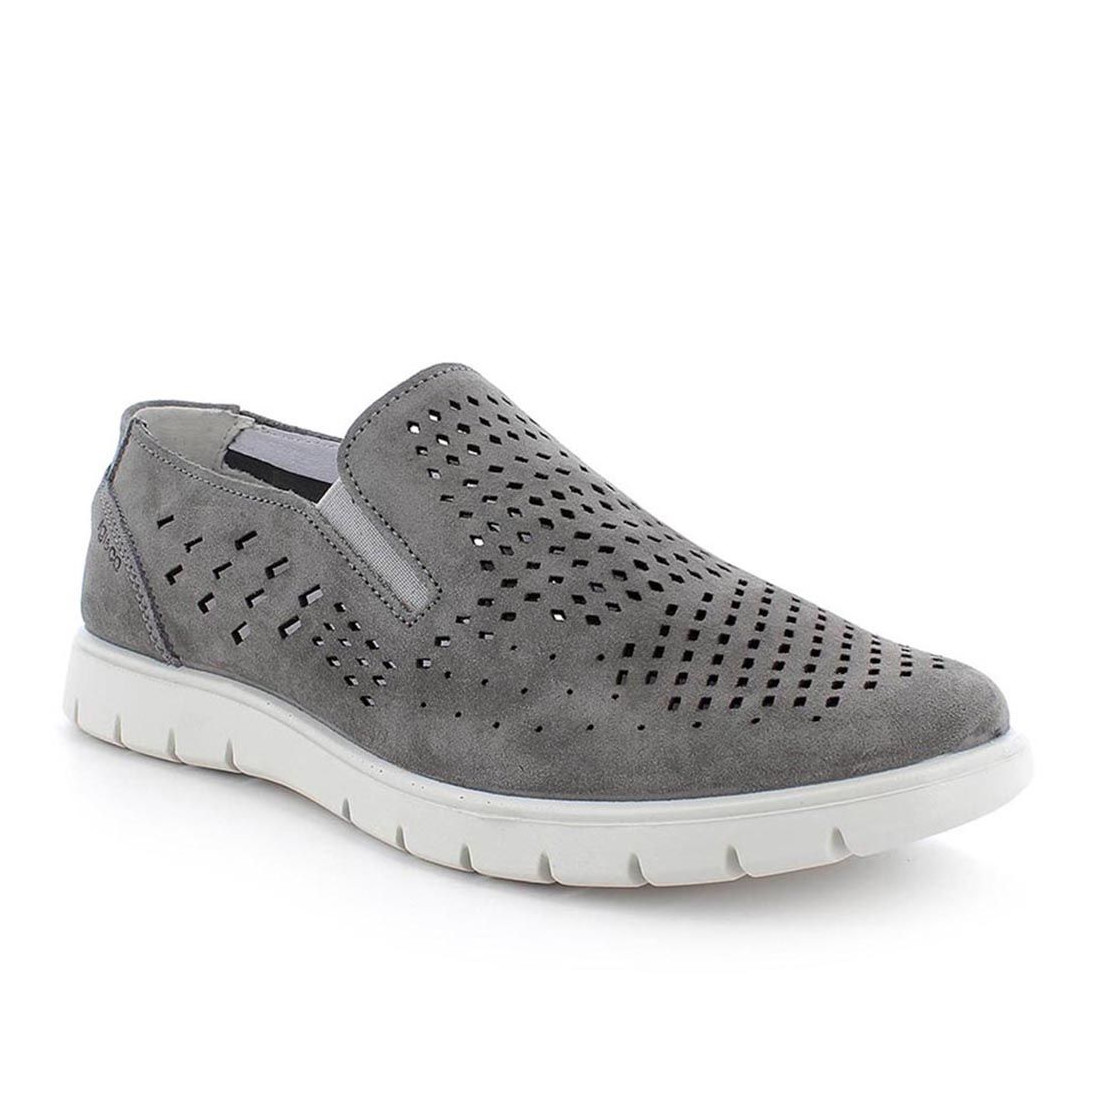 sneakers herren igico saxon7118444 8506